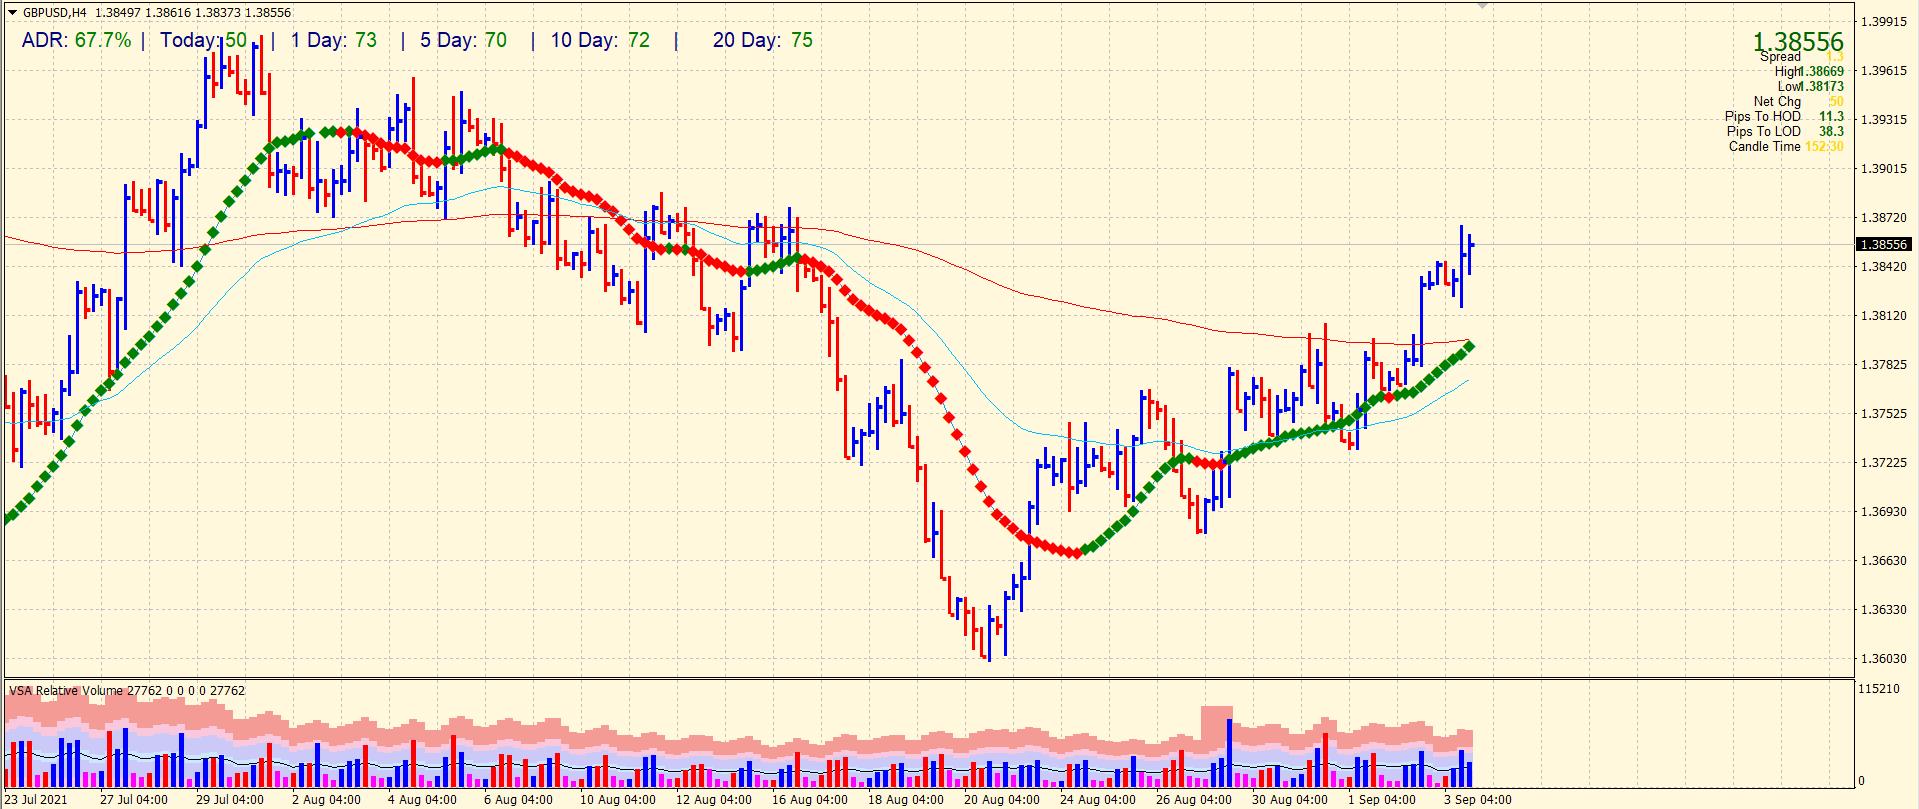 GBP/USD 4-hour chart forecast